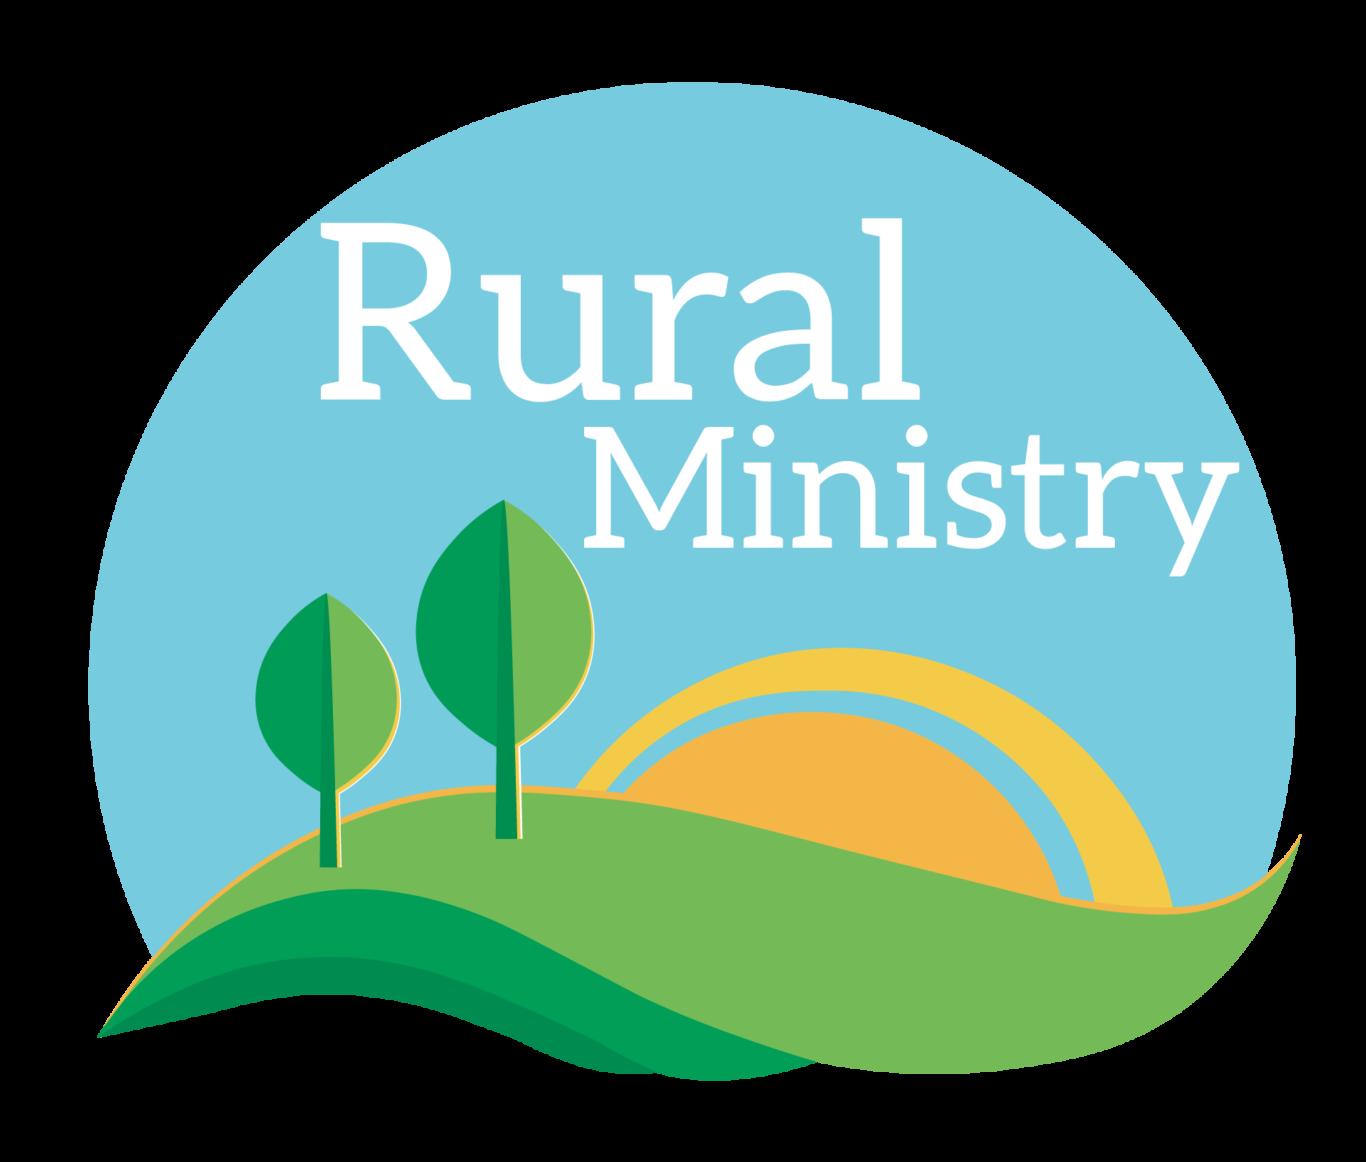 Rural ministry logo final